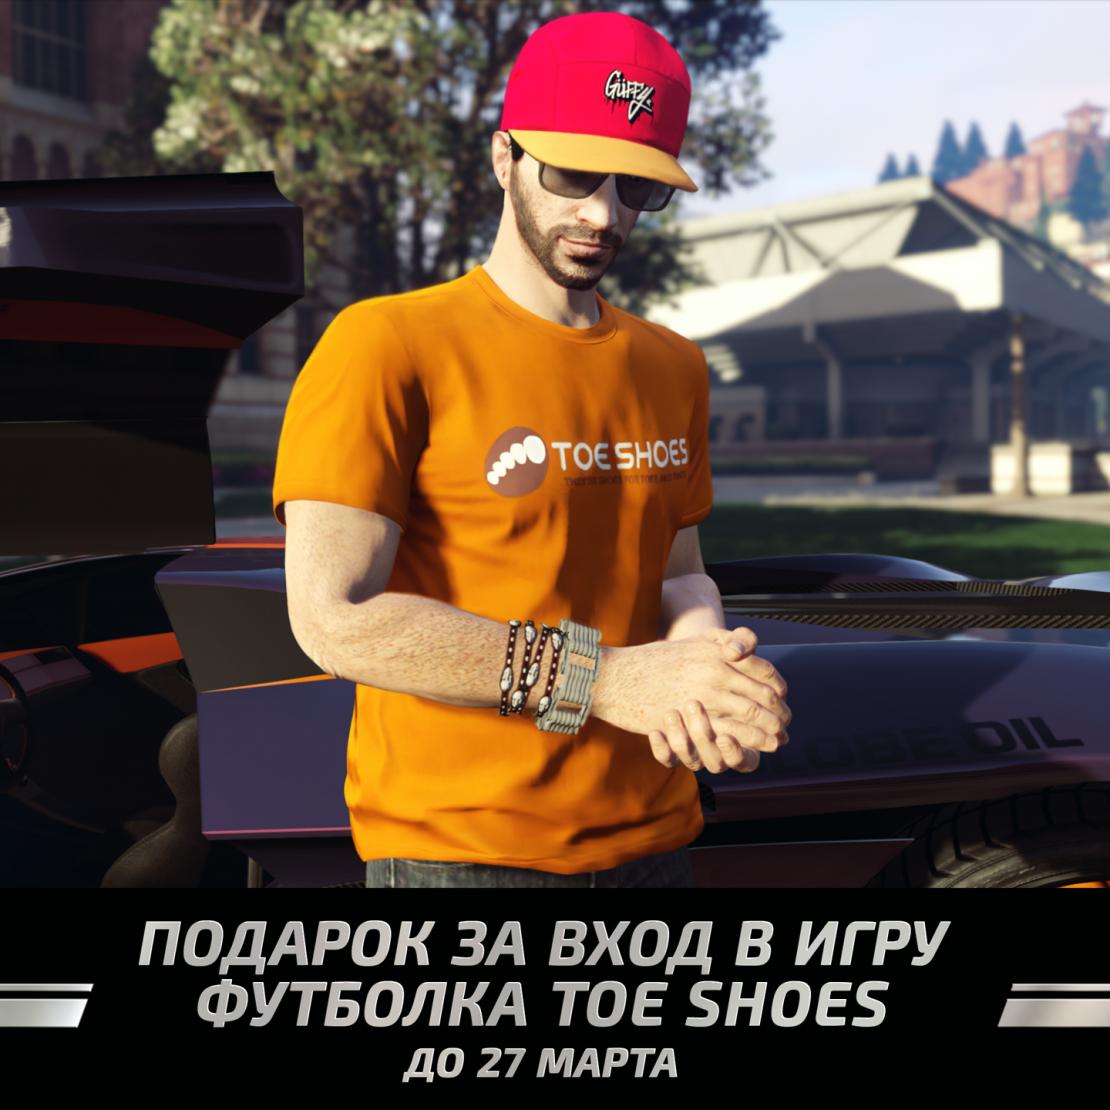 toe-shoes